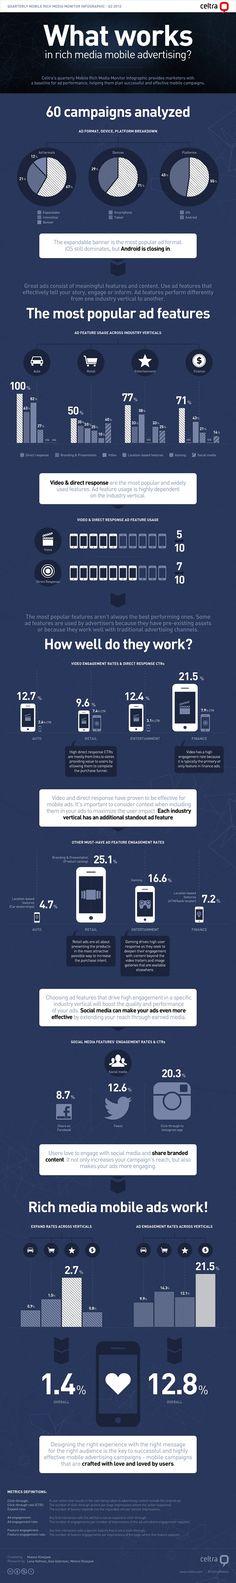 #Infographic #mobile #iphone #advertising Celtra Mobile Rich Media Monitor - Q2 http://dwmc.mobi